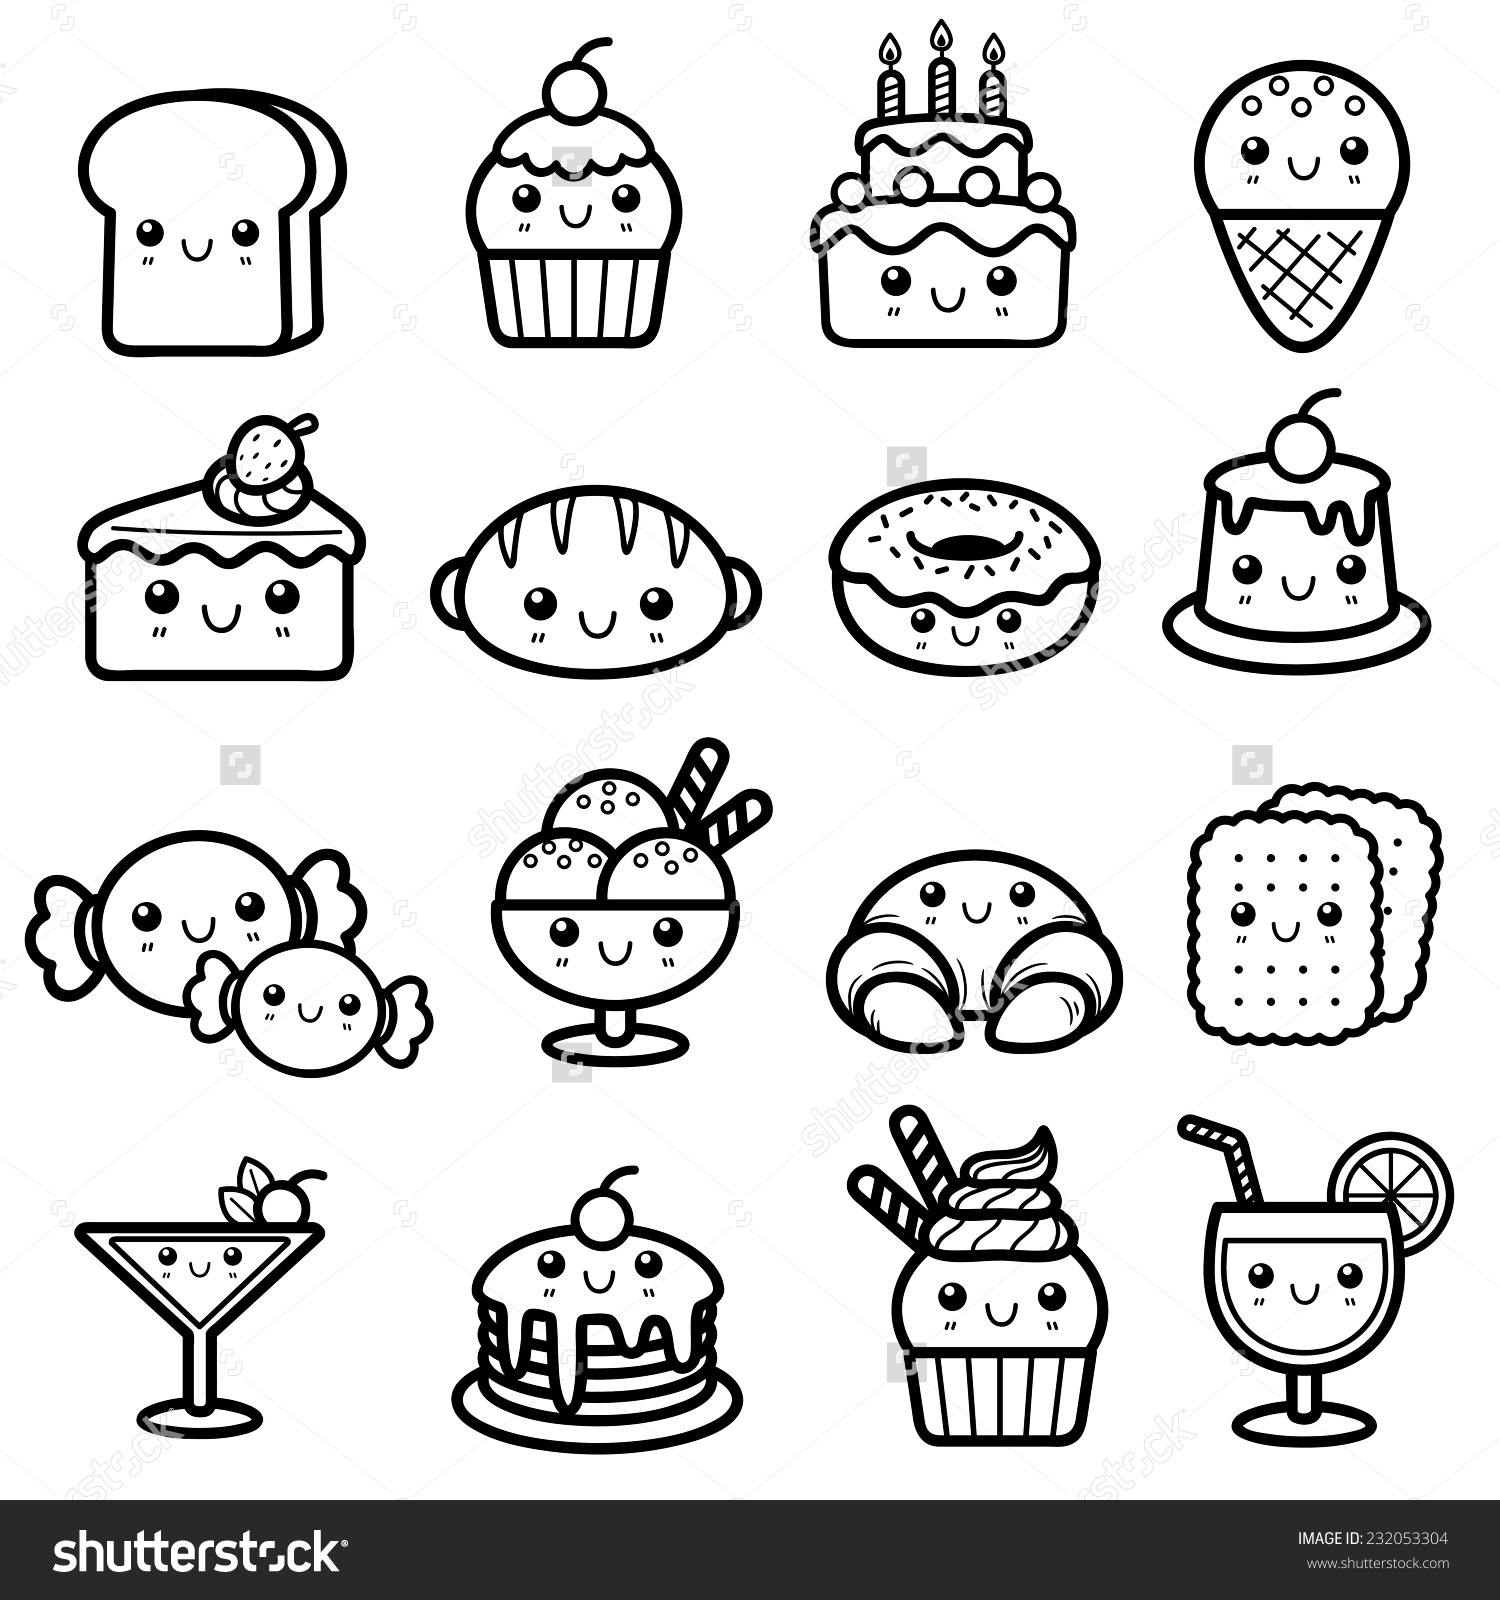 Dessert Coloring Download Dessert Coloring